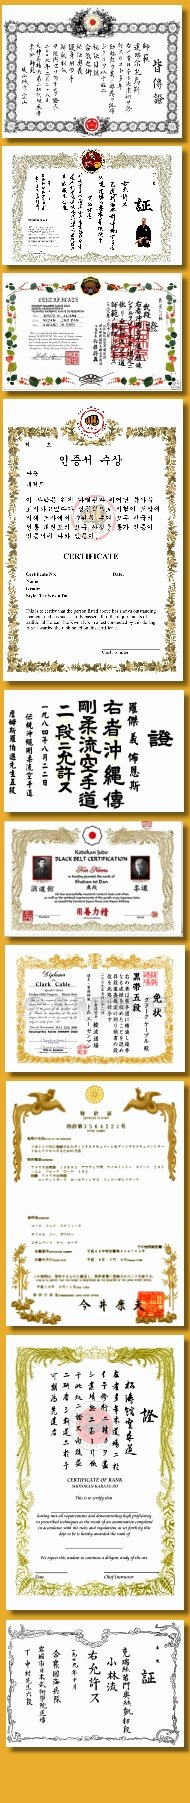 Martial Arts Certificate Creator Program Inspirational Martial Arts Certificates for Your School or organization